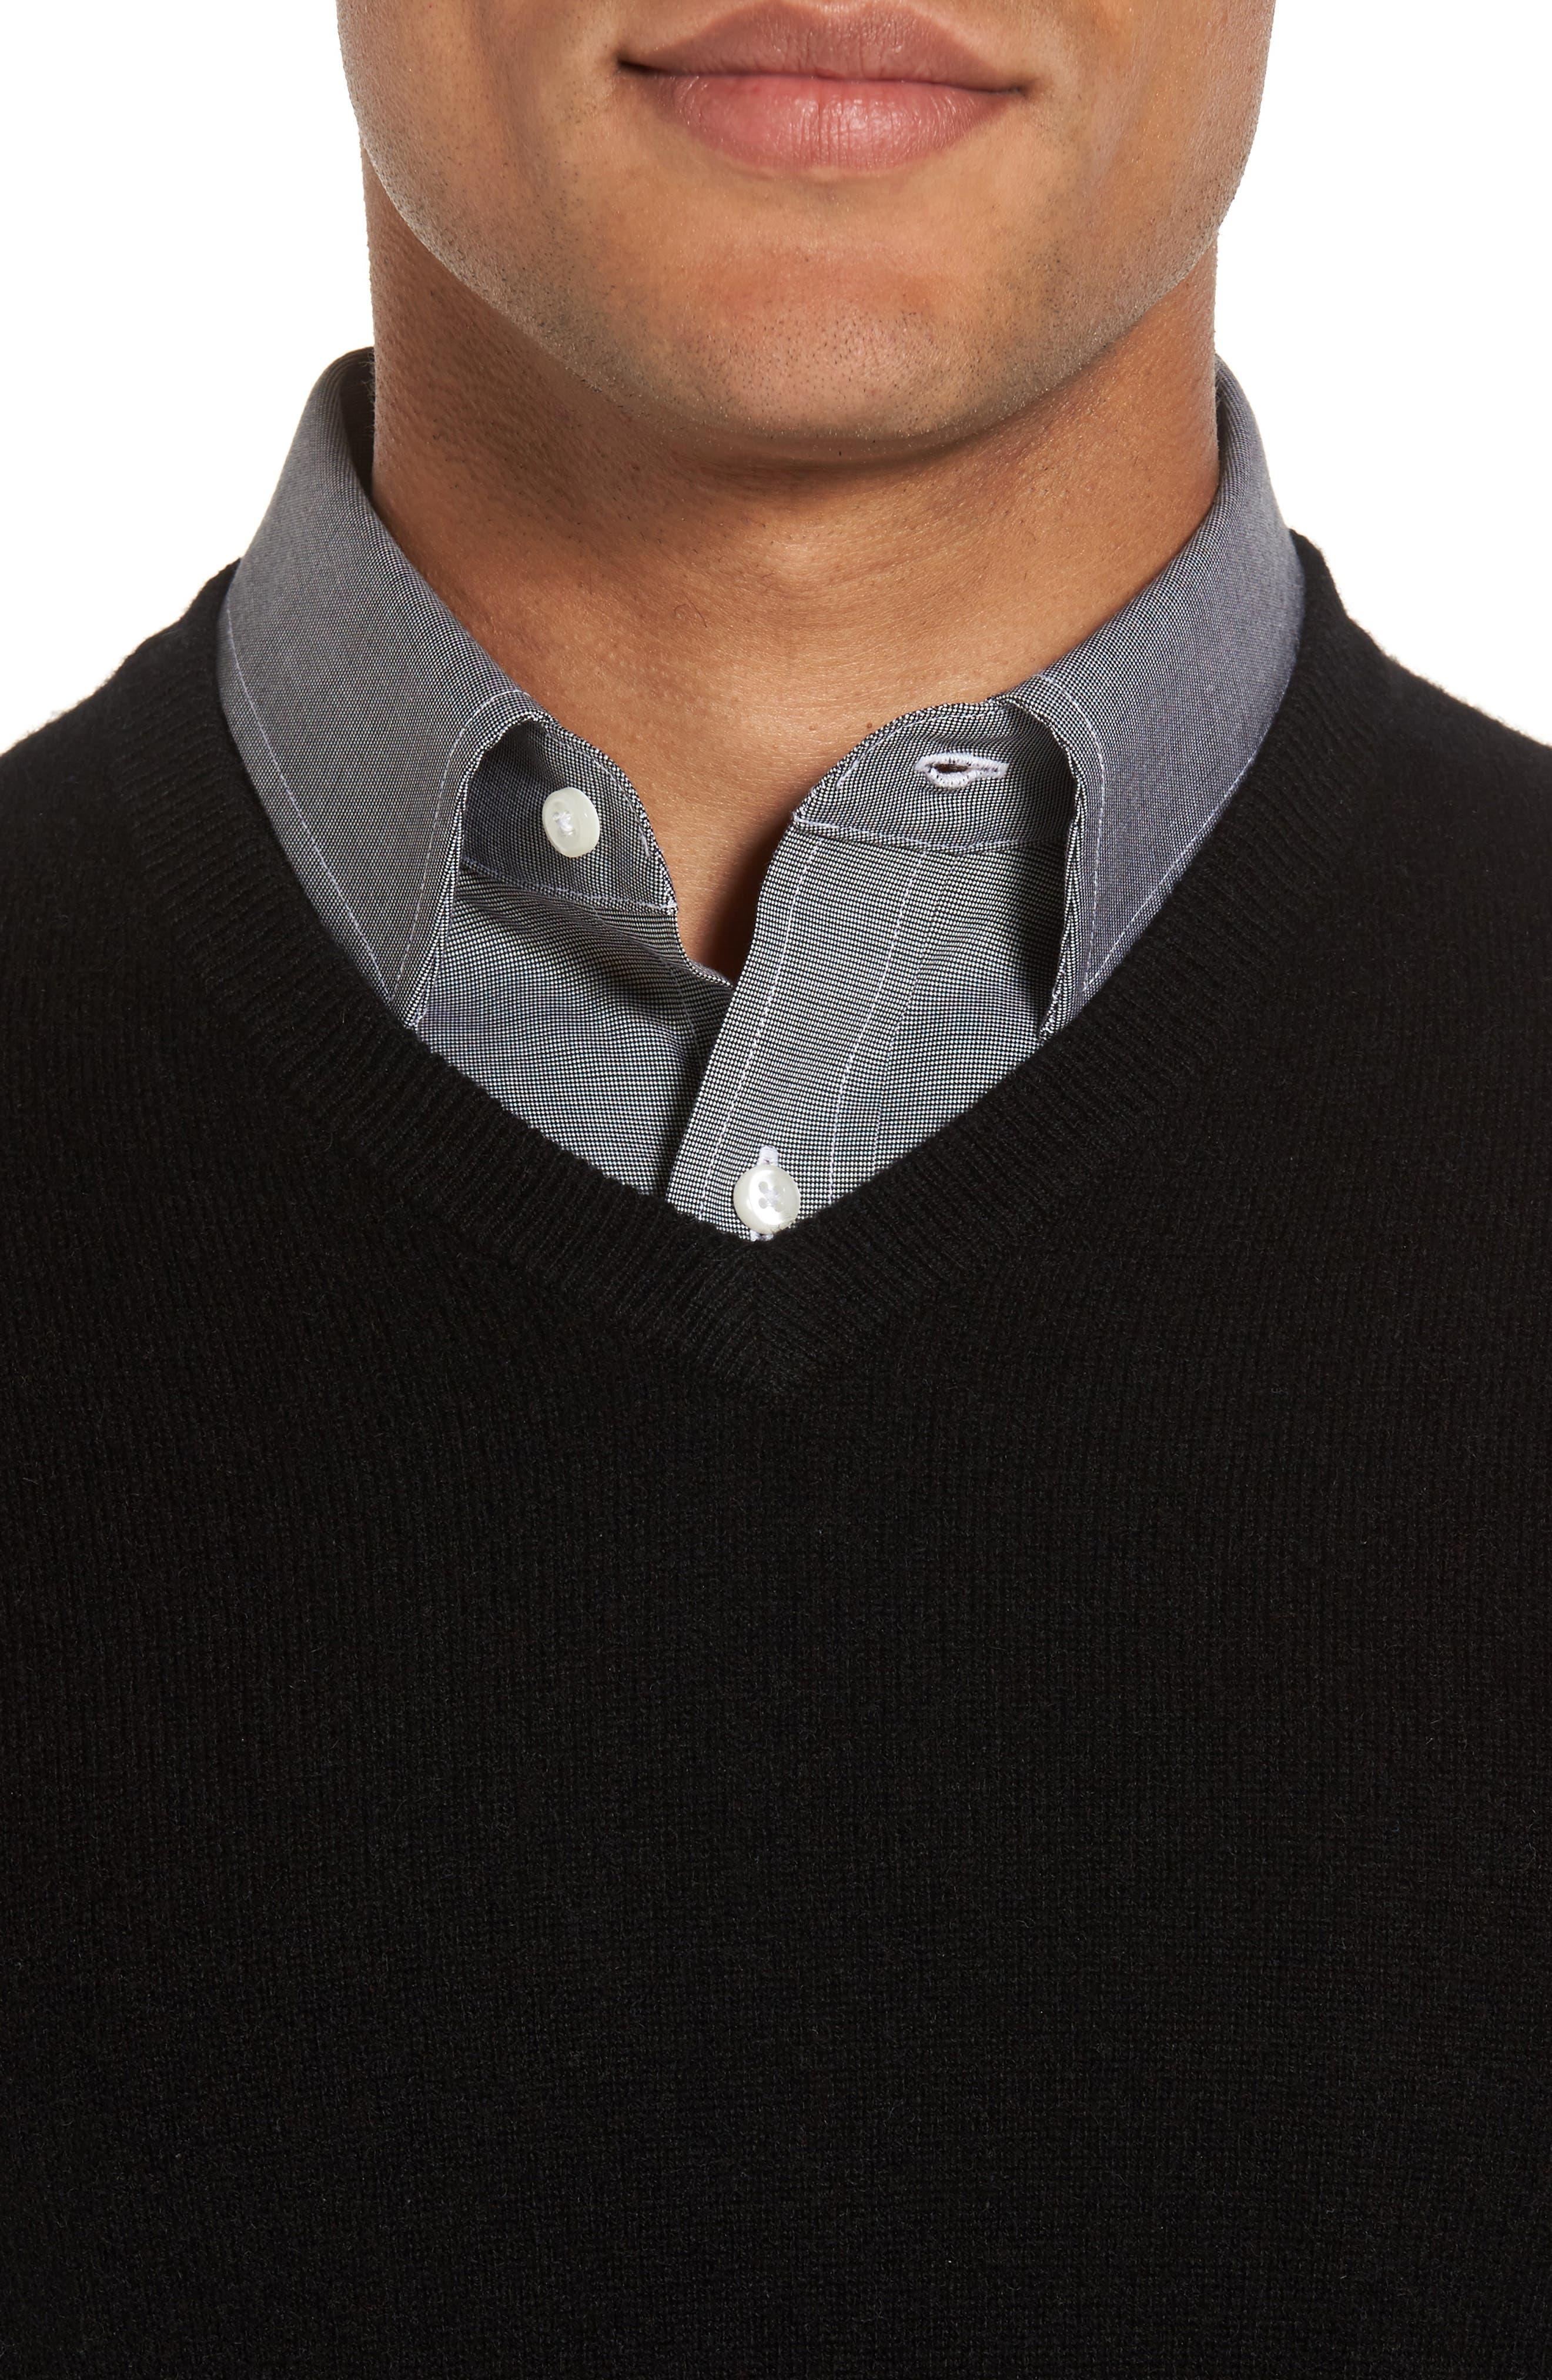 NORDSTROM MEN'S SHOP,                             Cashmere V-Neck Sweater,                             Alternate thumbnail 4, color,                             BLACK CAVIAR